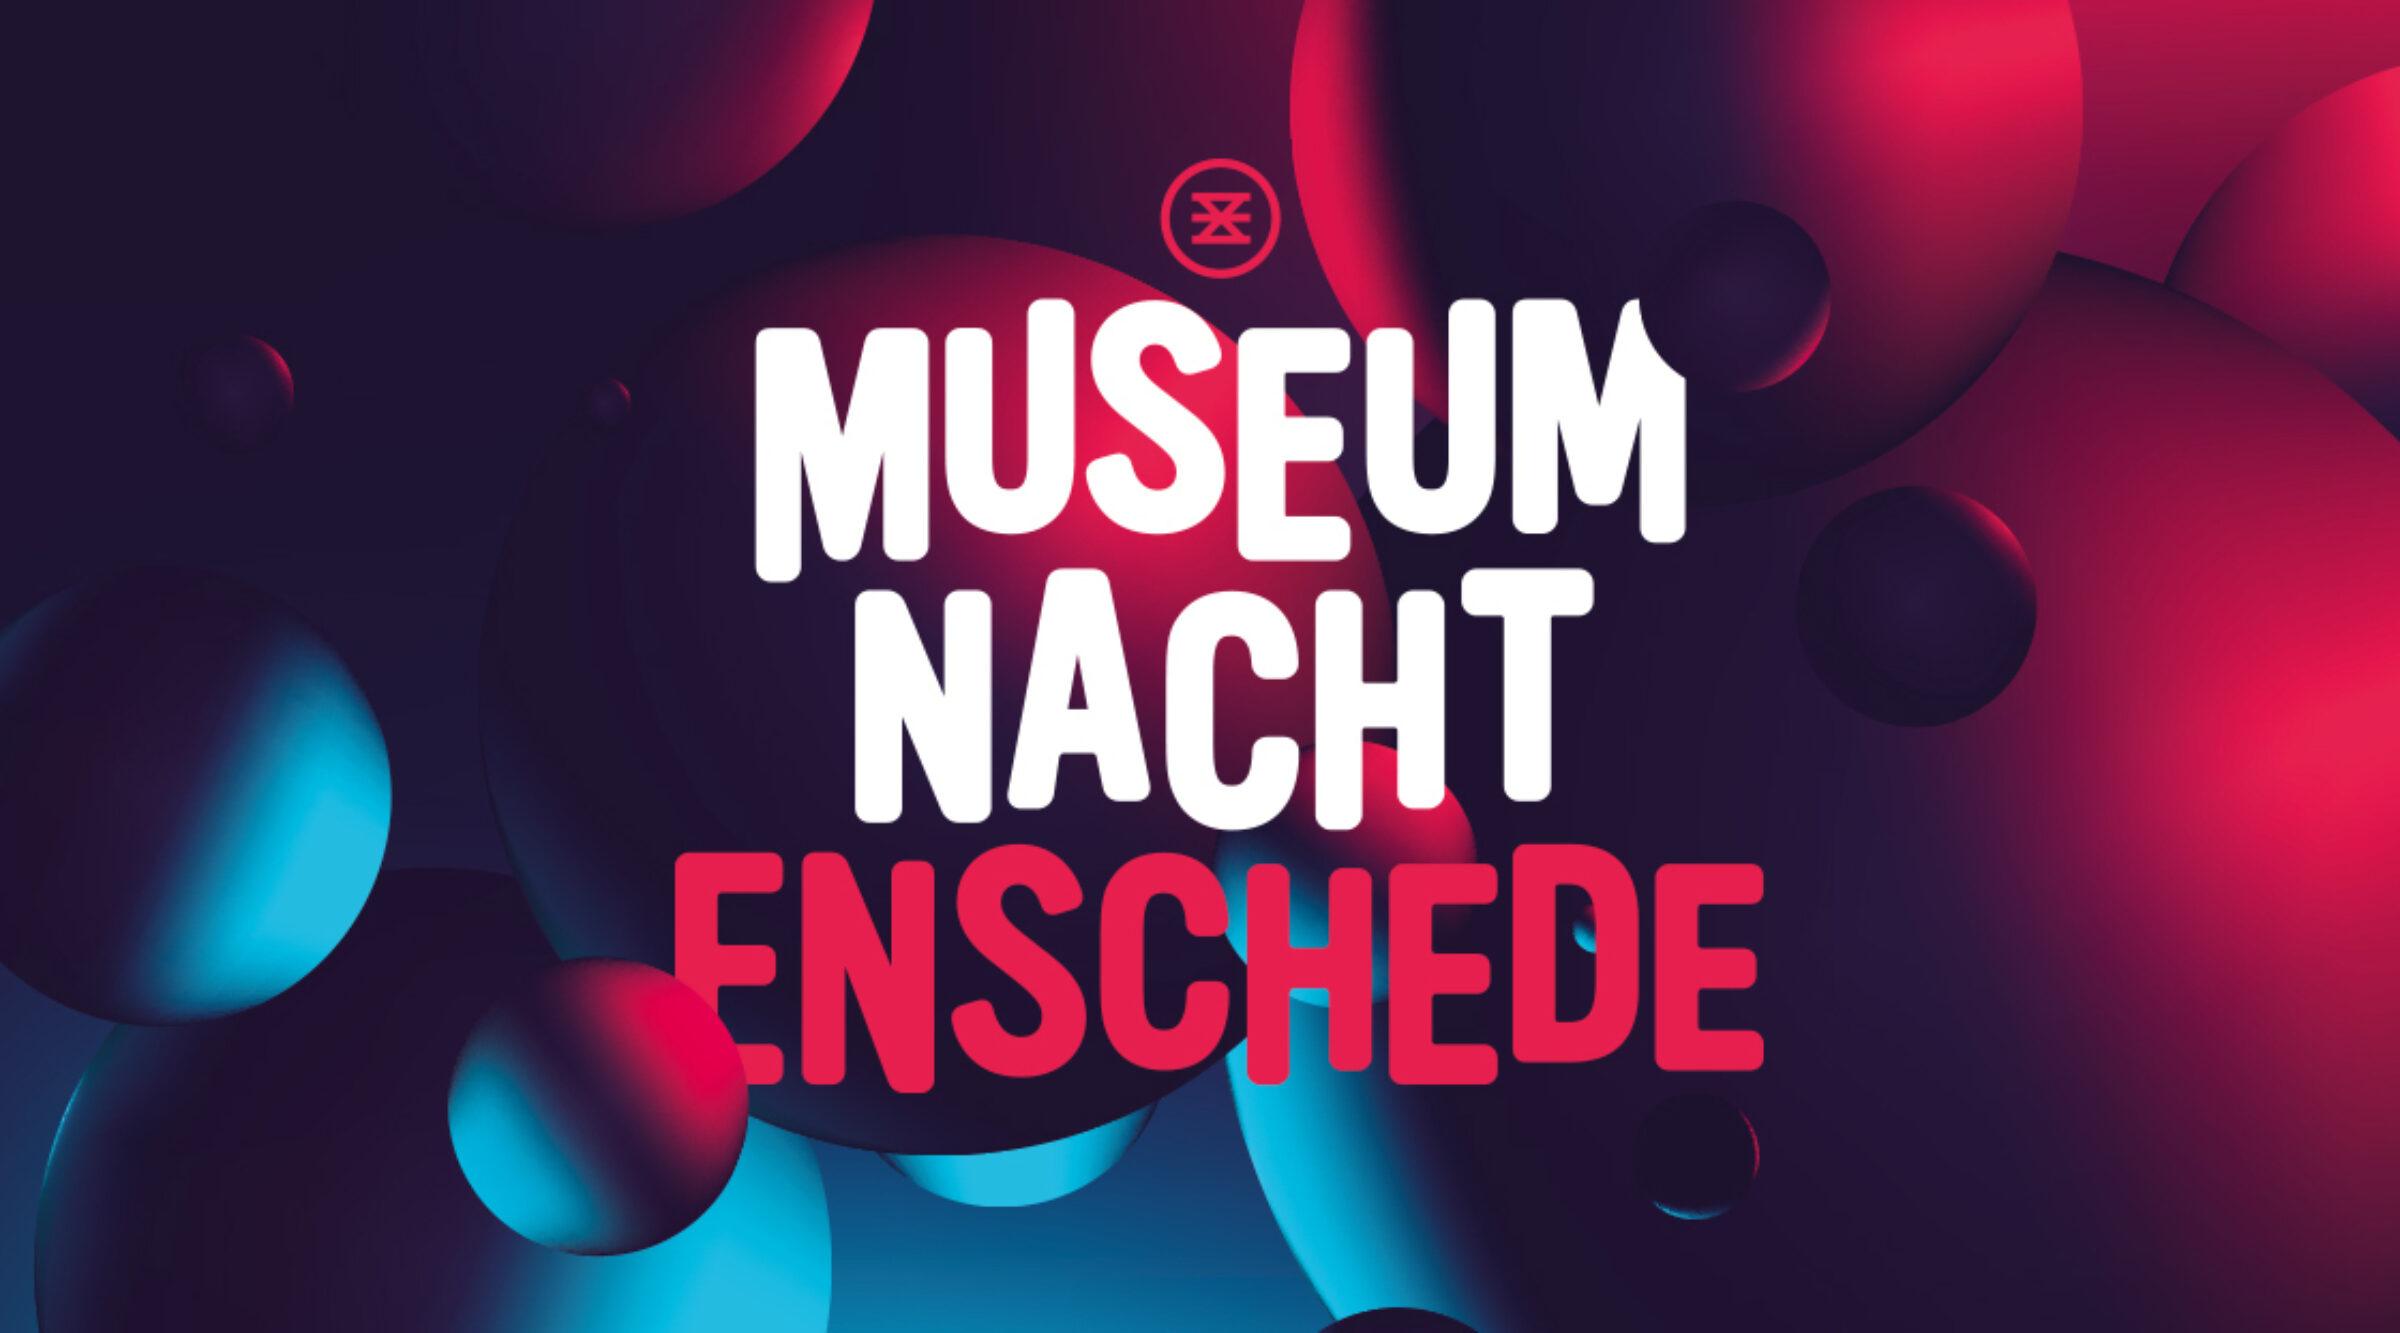 Museumnacht Enschede